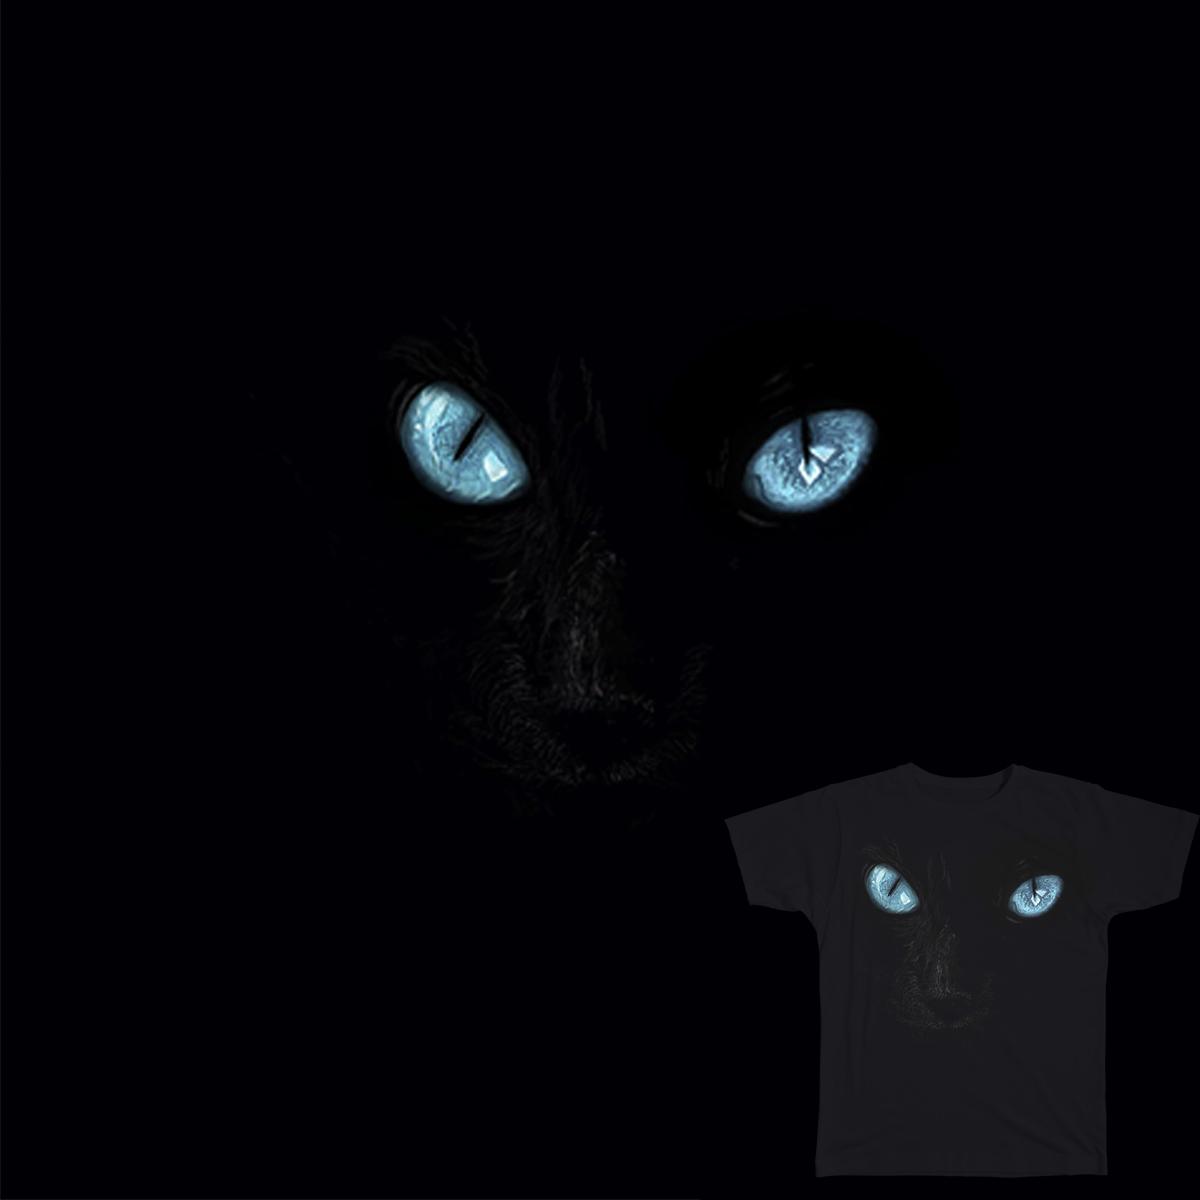 Eyes in the dark by Aimee_Monk on Threadless